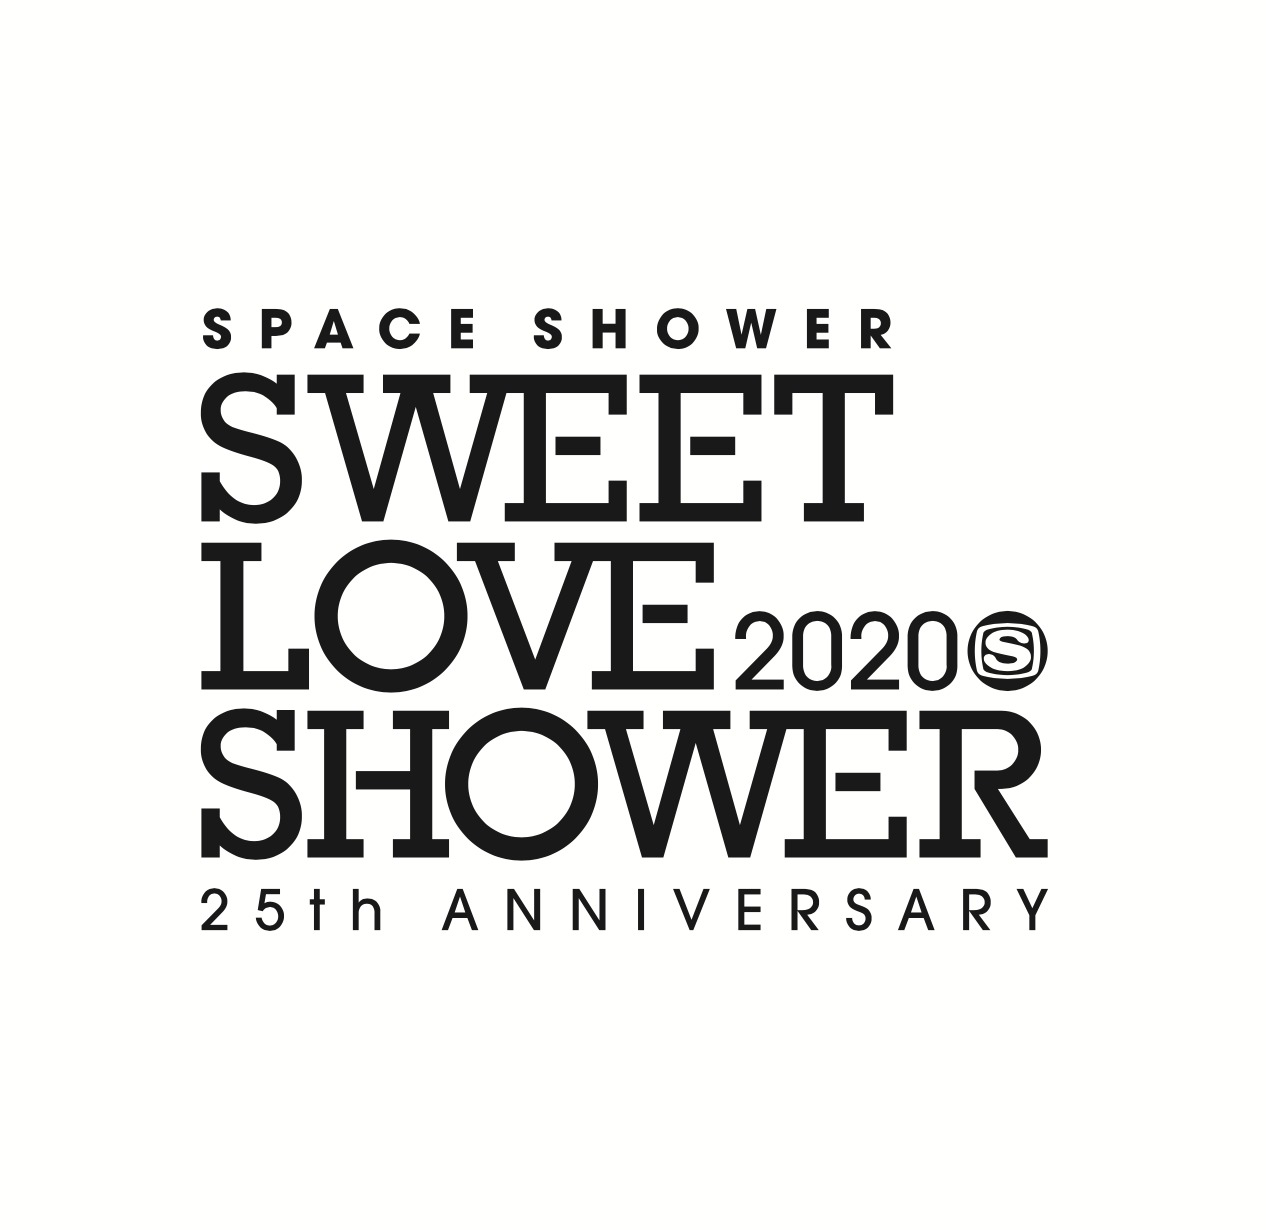 SPACE SHOWER SWEET LOVE SHOWER 2020 -25th ANNIVERSARY-